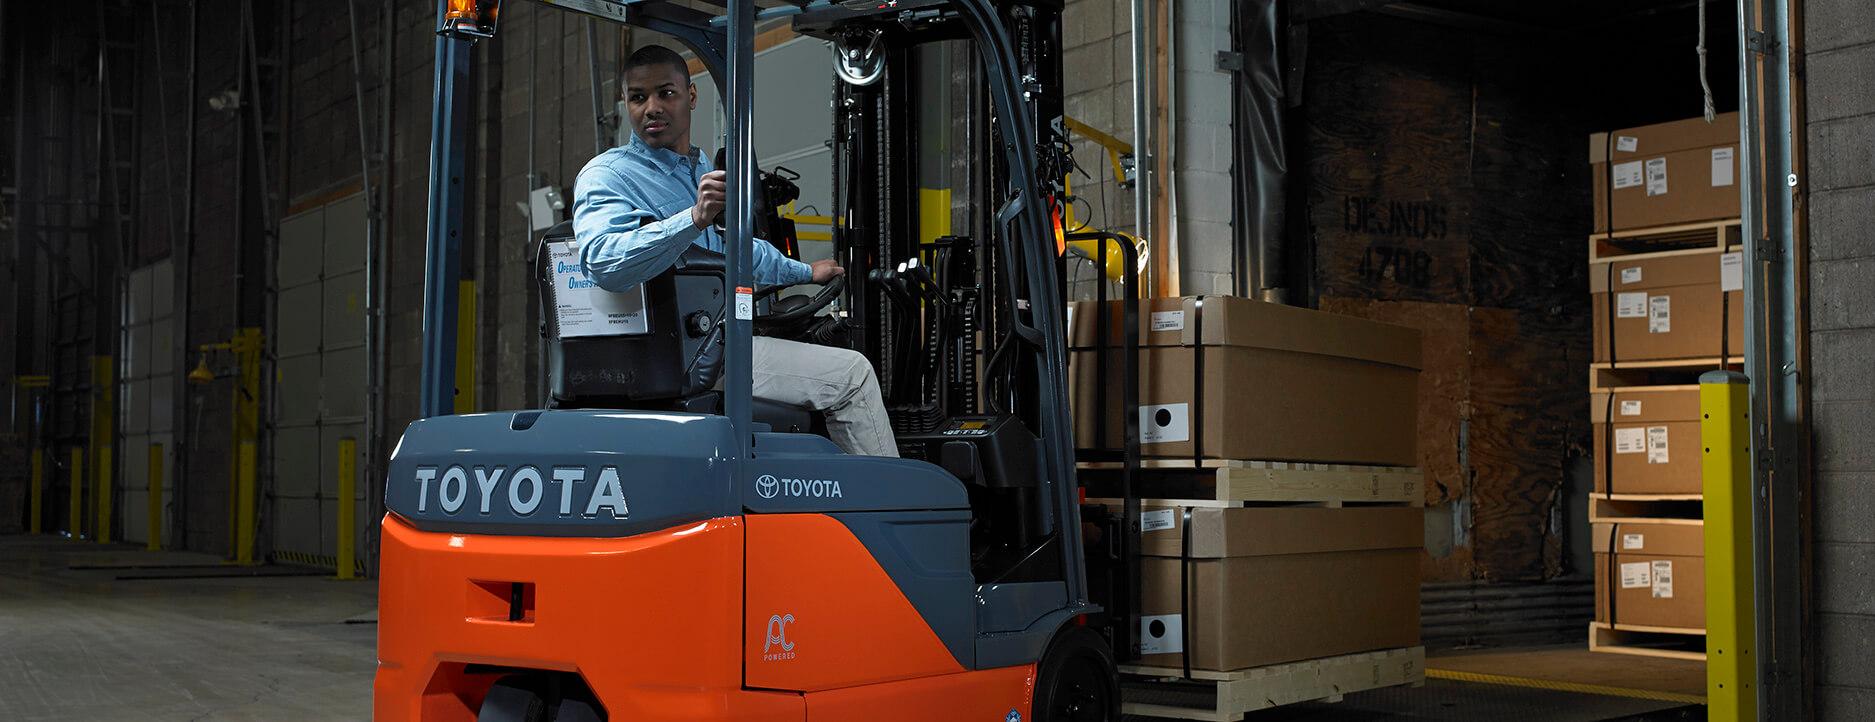 warehouse loading dock manual lift